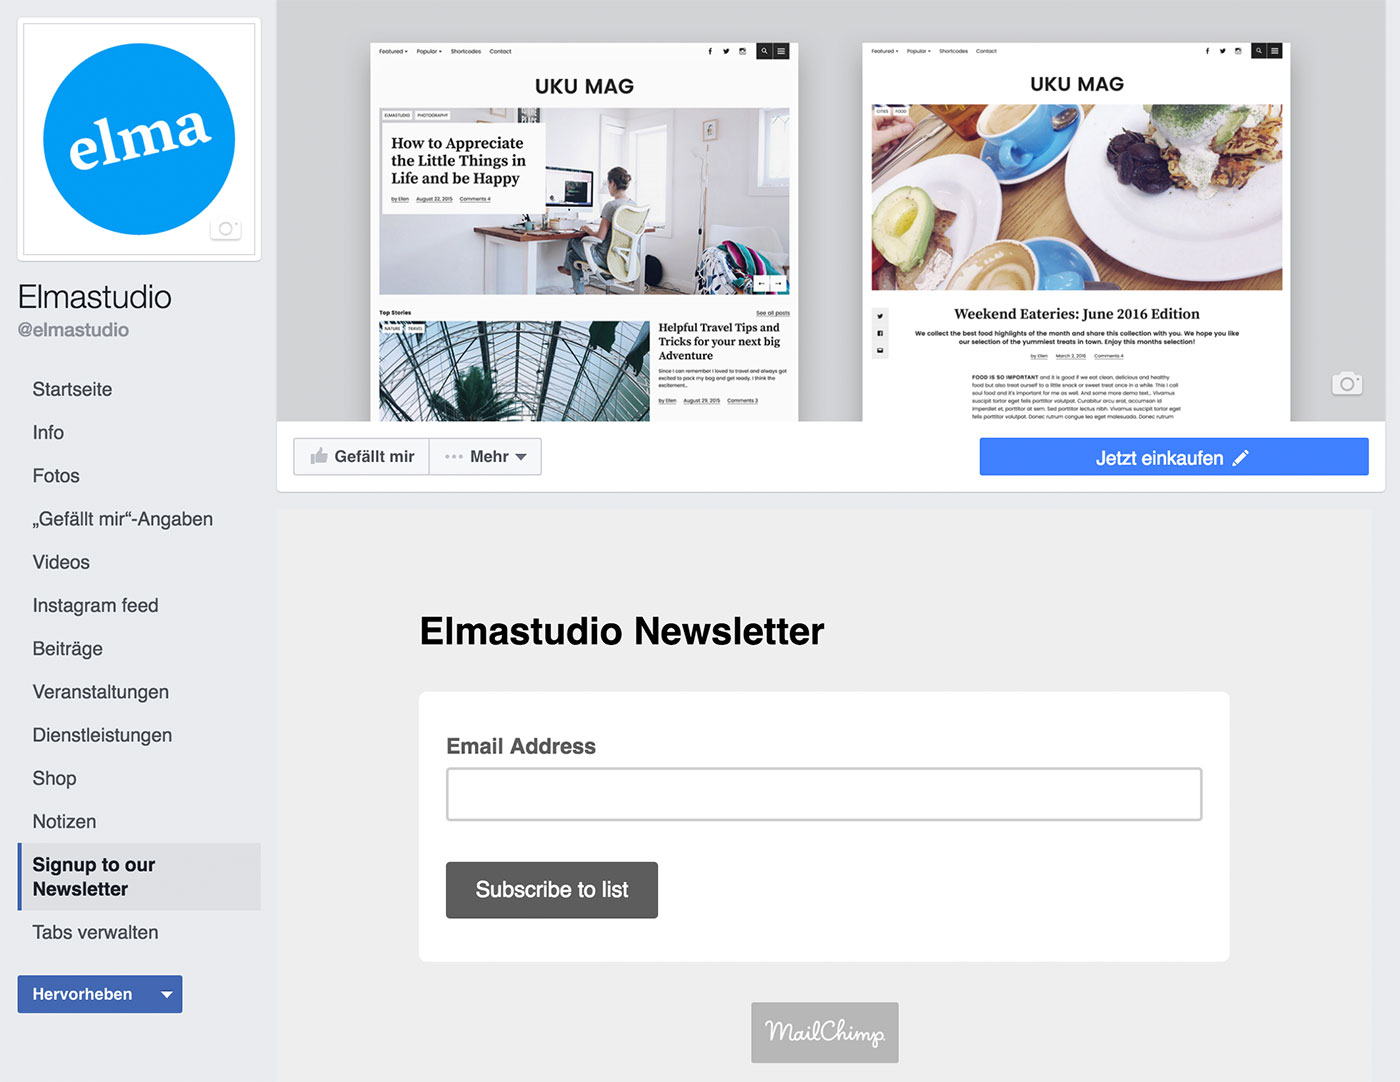 mailchimp-facebook-integration-05